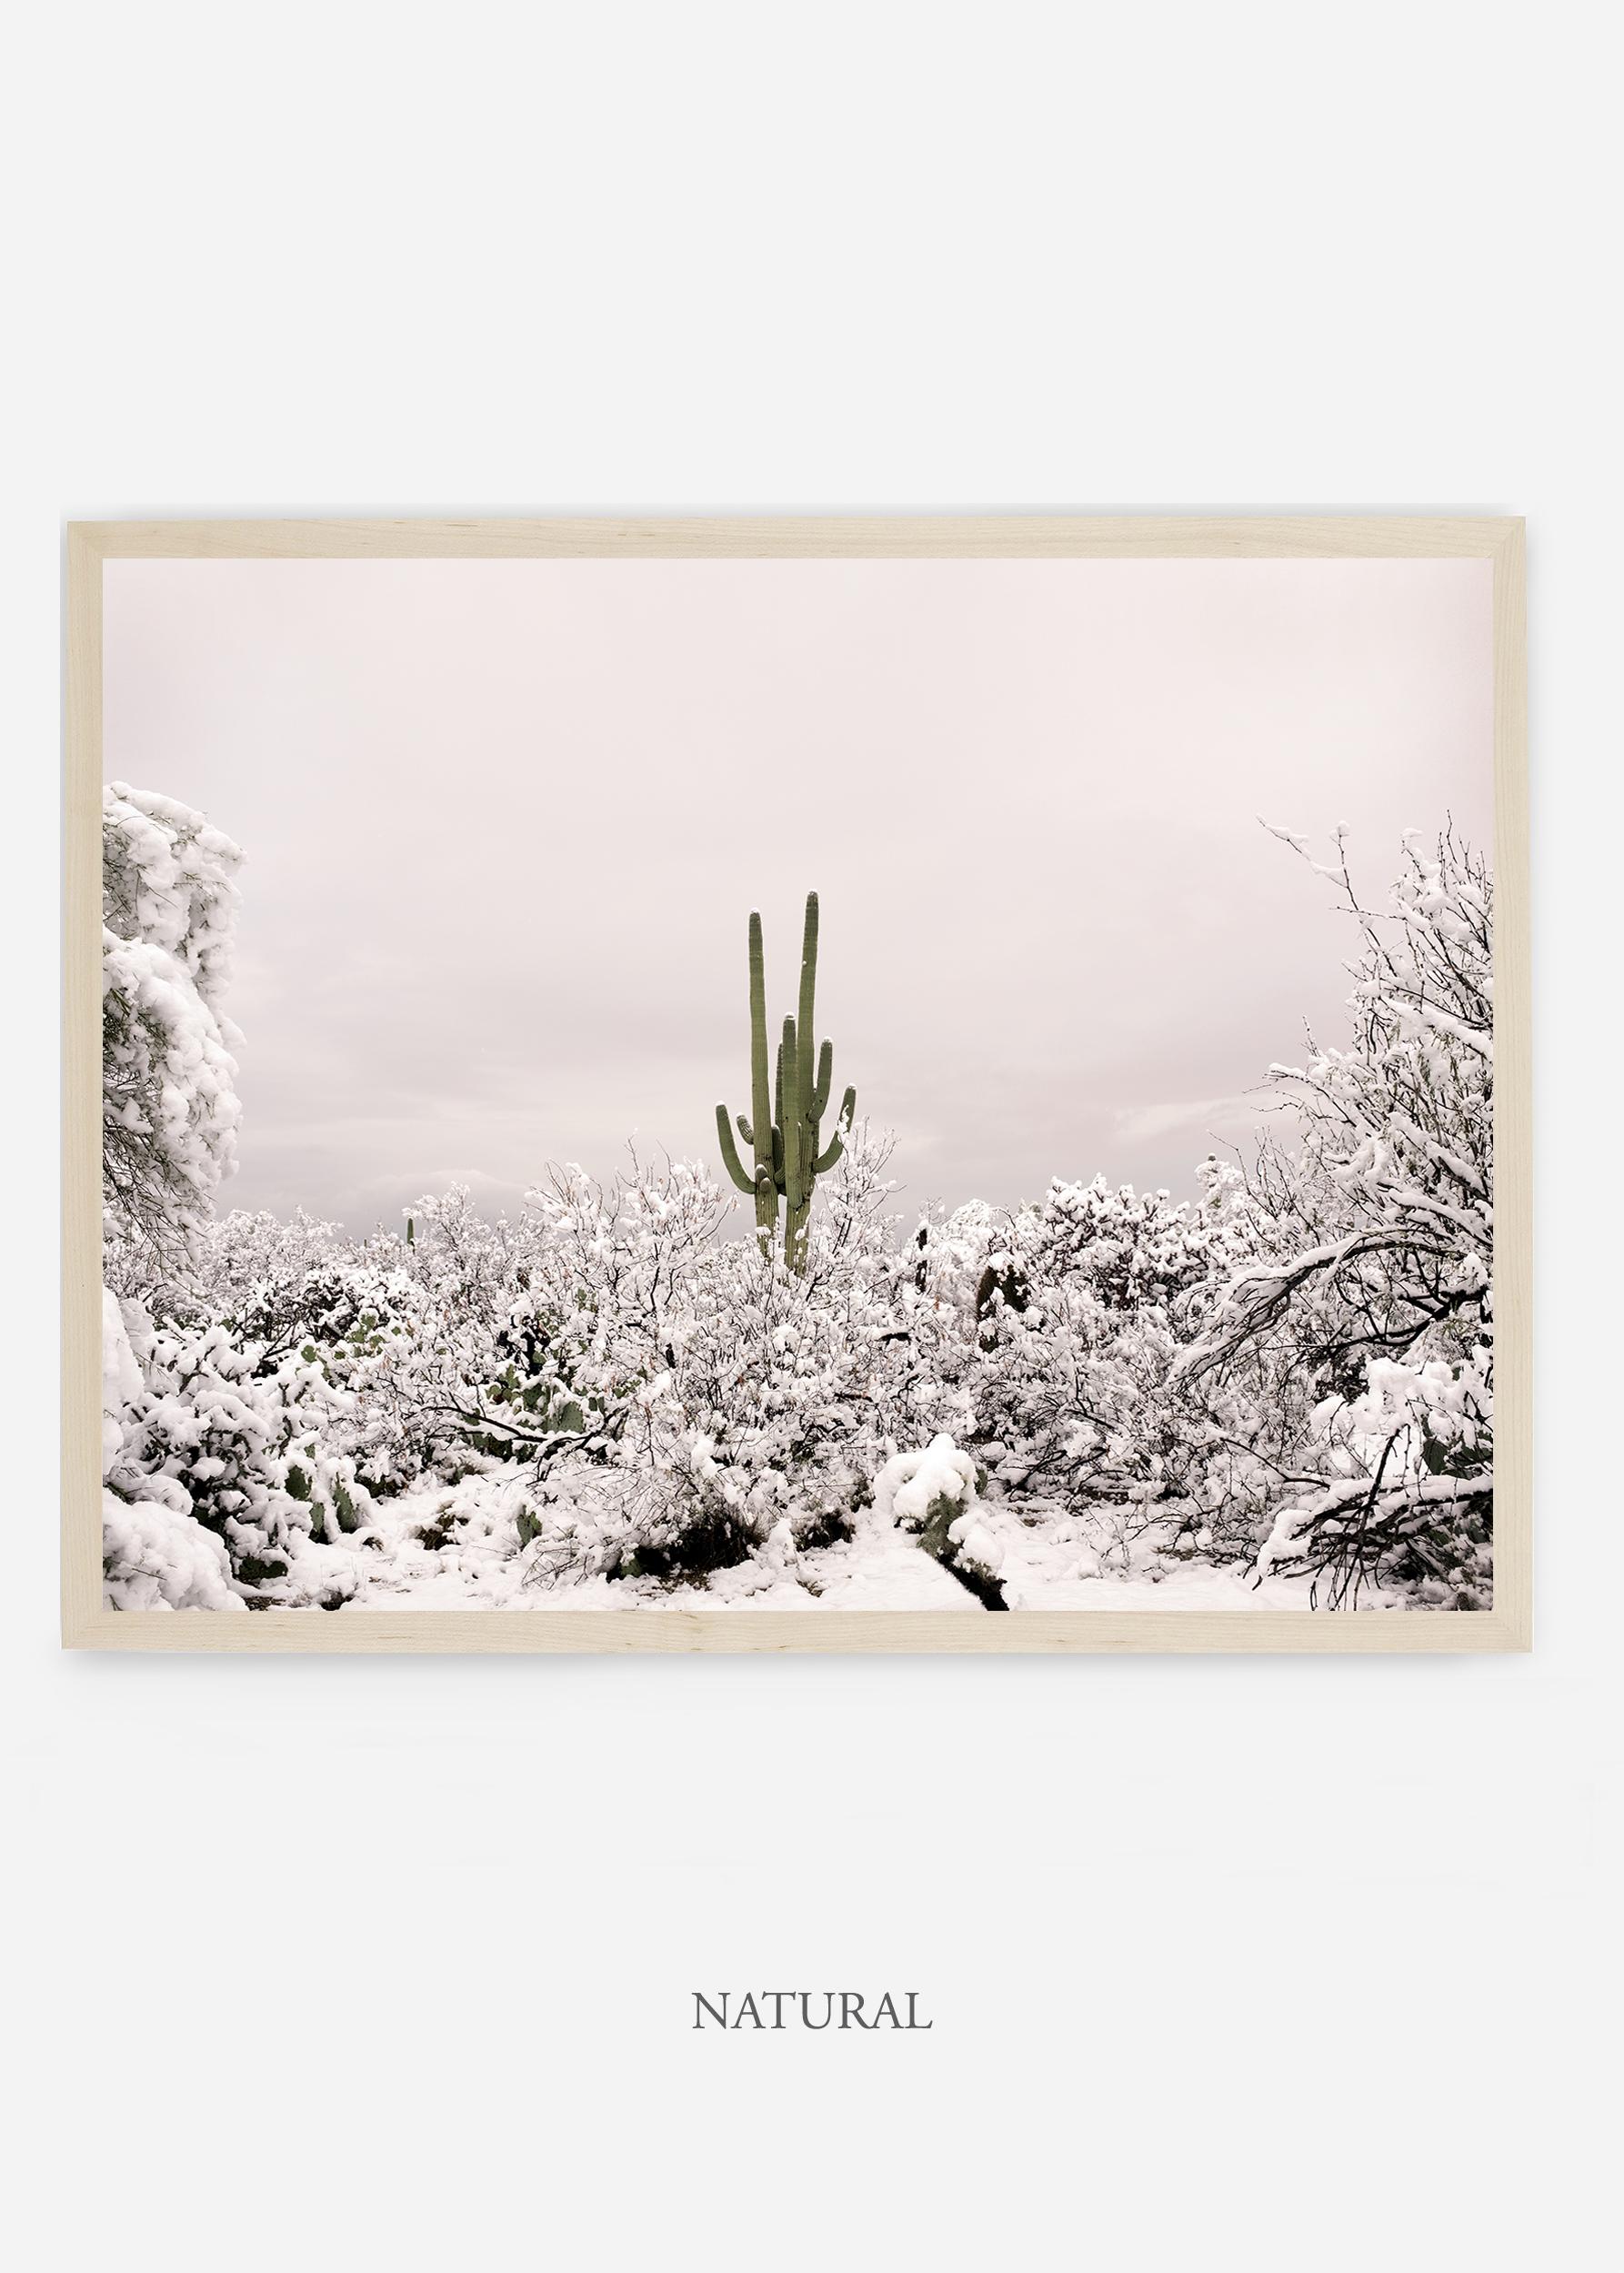 nomat_naturalframe-saguaroNo.1-wildercalifornia-art-wallart-cactusprint-homedecor-prints-arizona-botanical-artwork-interiordesign.jpg